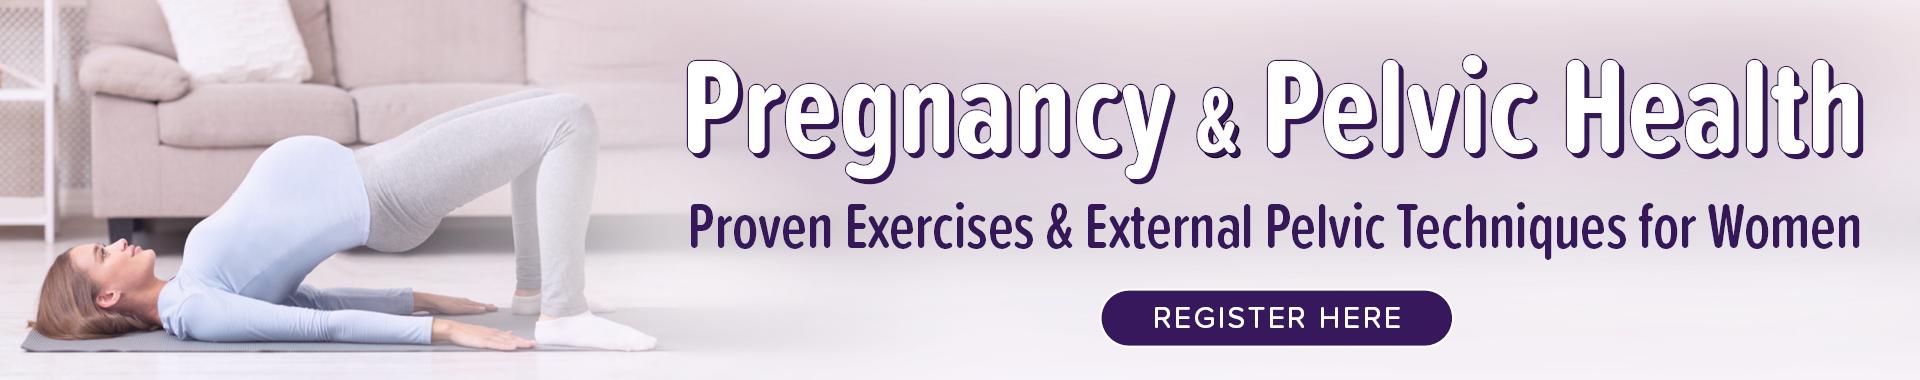 Pregnancy & Pelvic Health: Proven Exercises & External Pelvic Techniques for Women